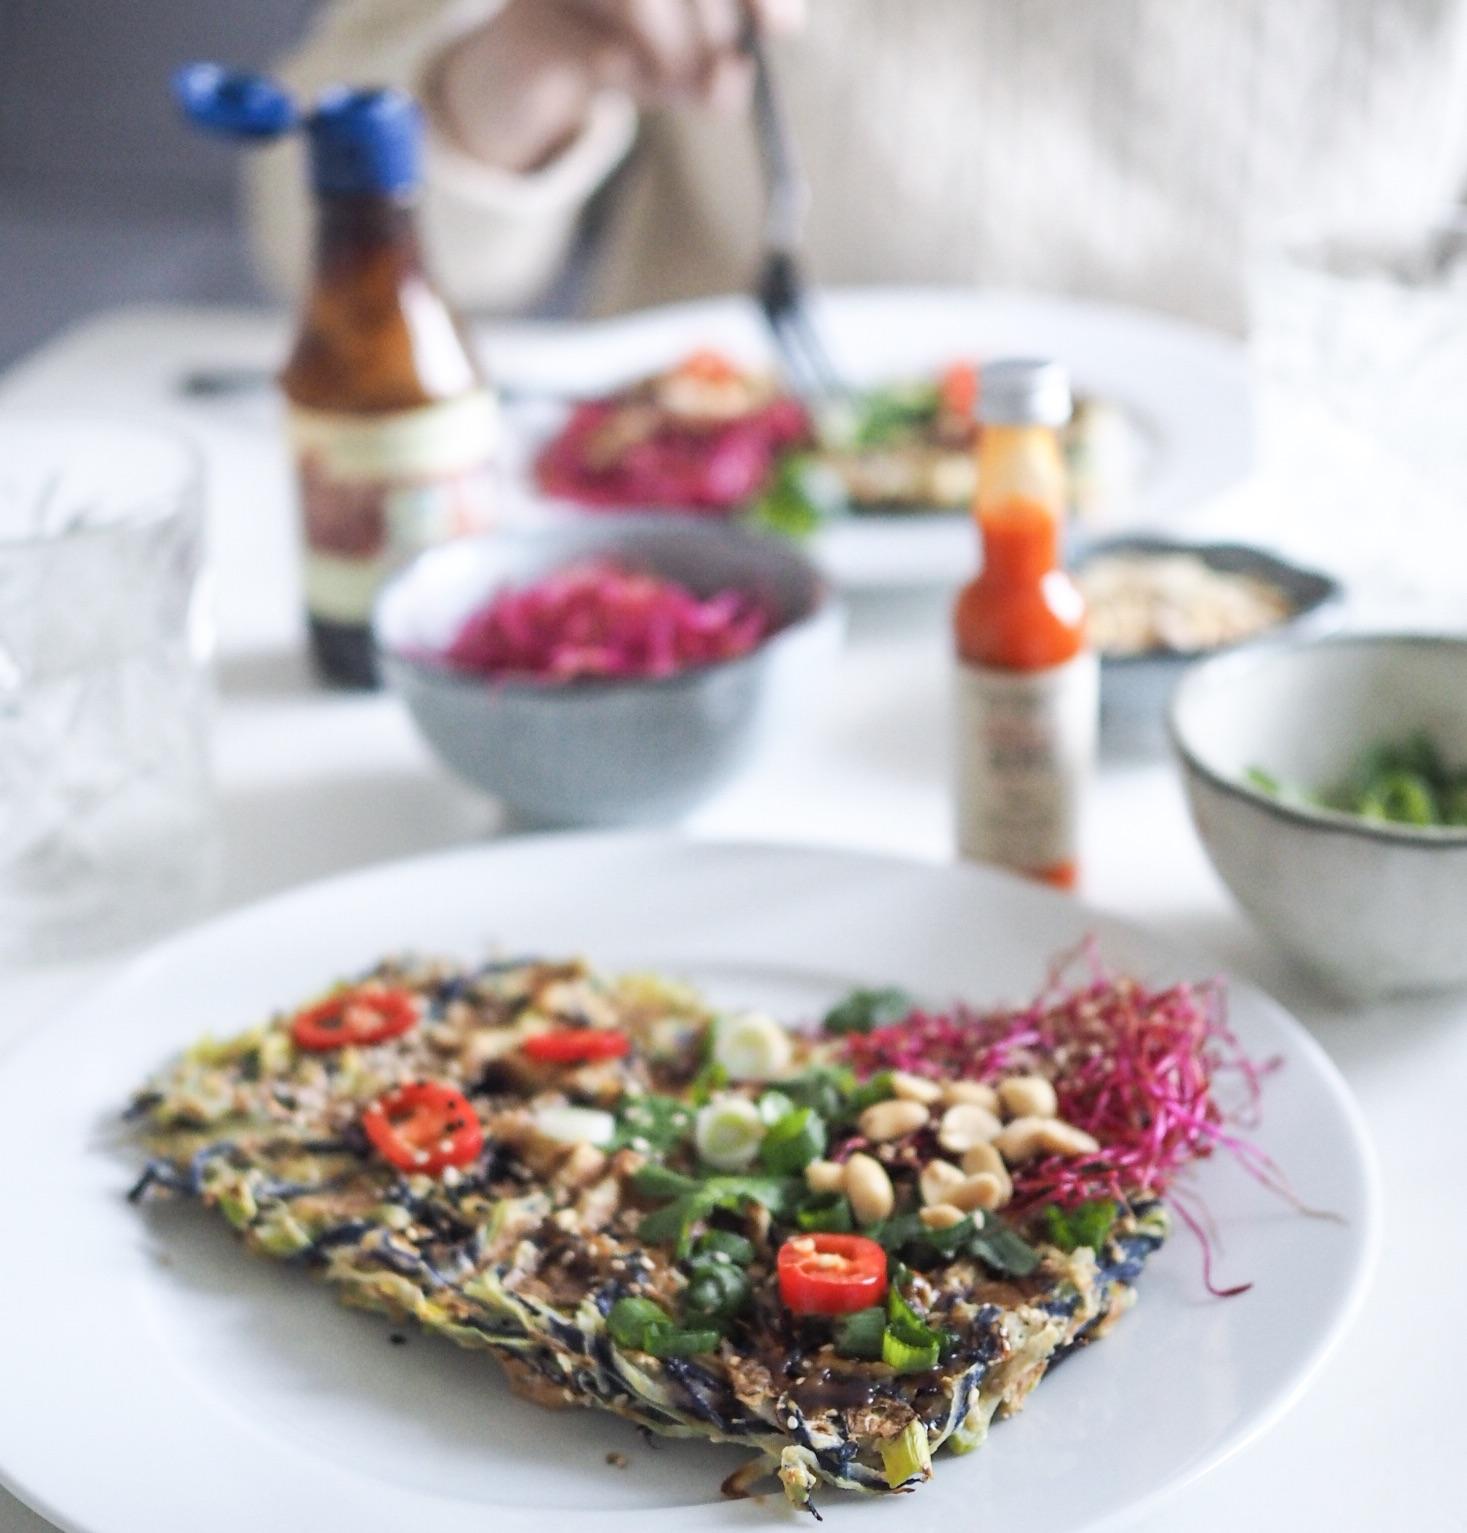 Okonomiyaki vafler med hoisinsauce og koriander. Billede hvor der er en der spiser. Hoisinsauce i baggrunden og middag for to